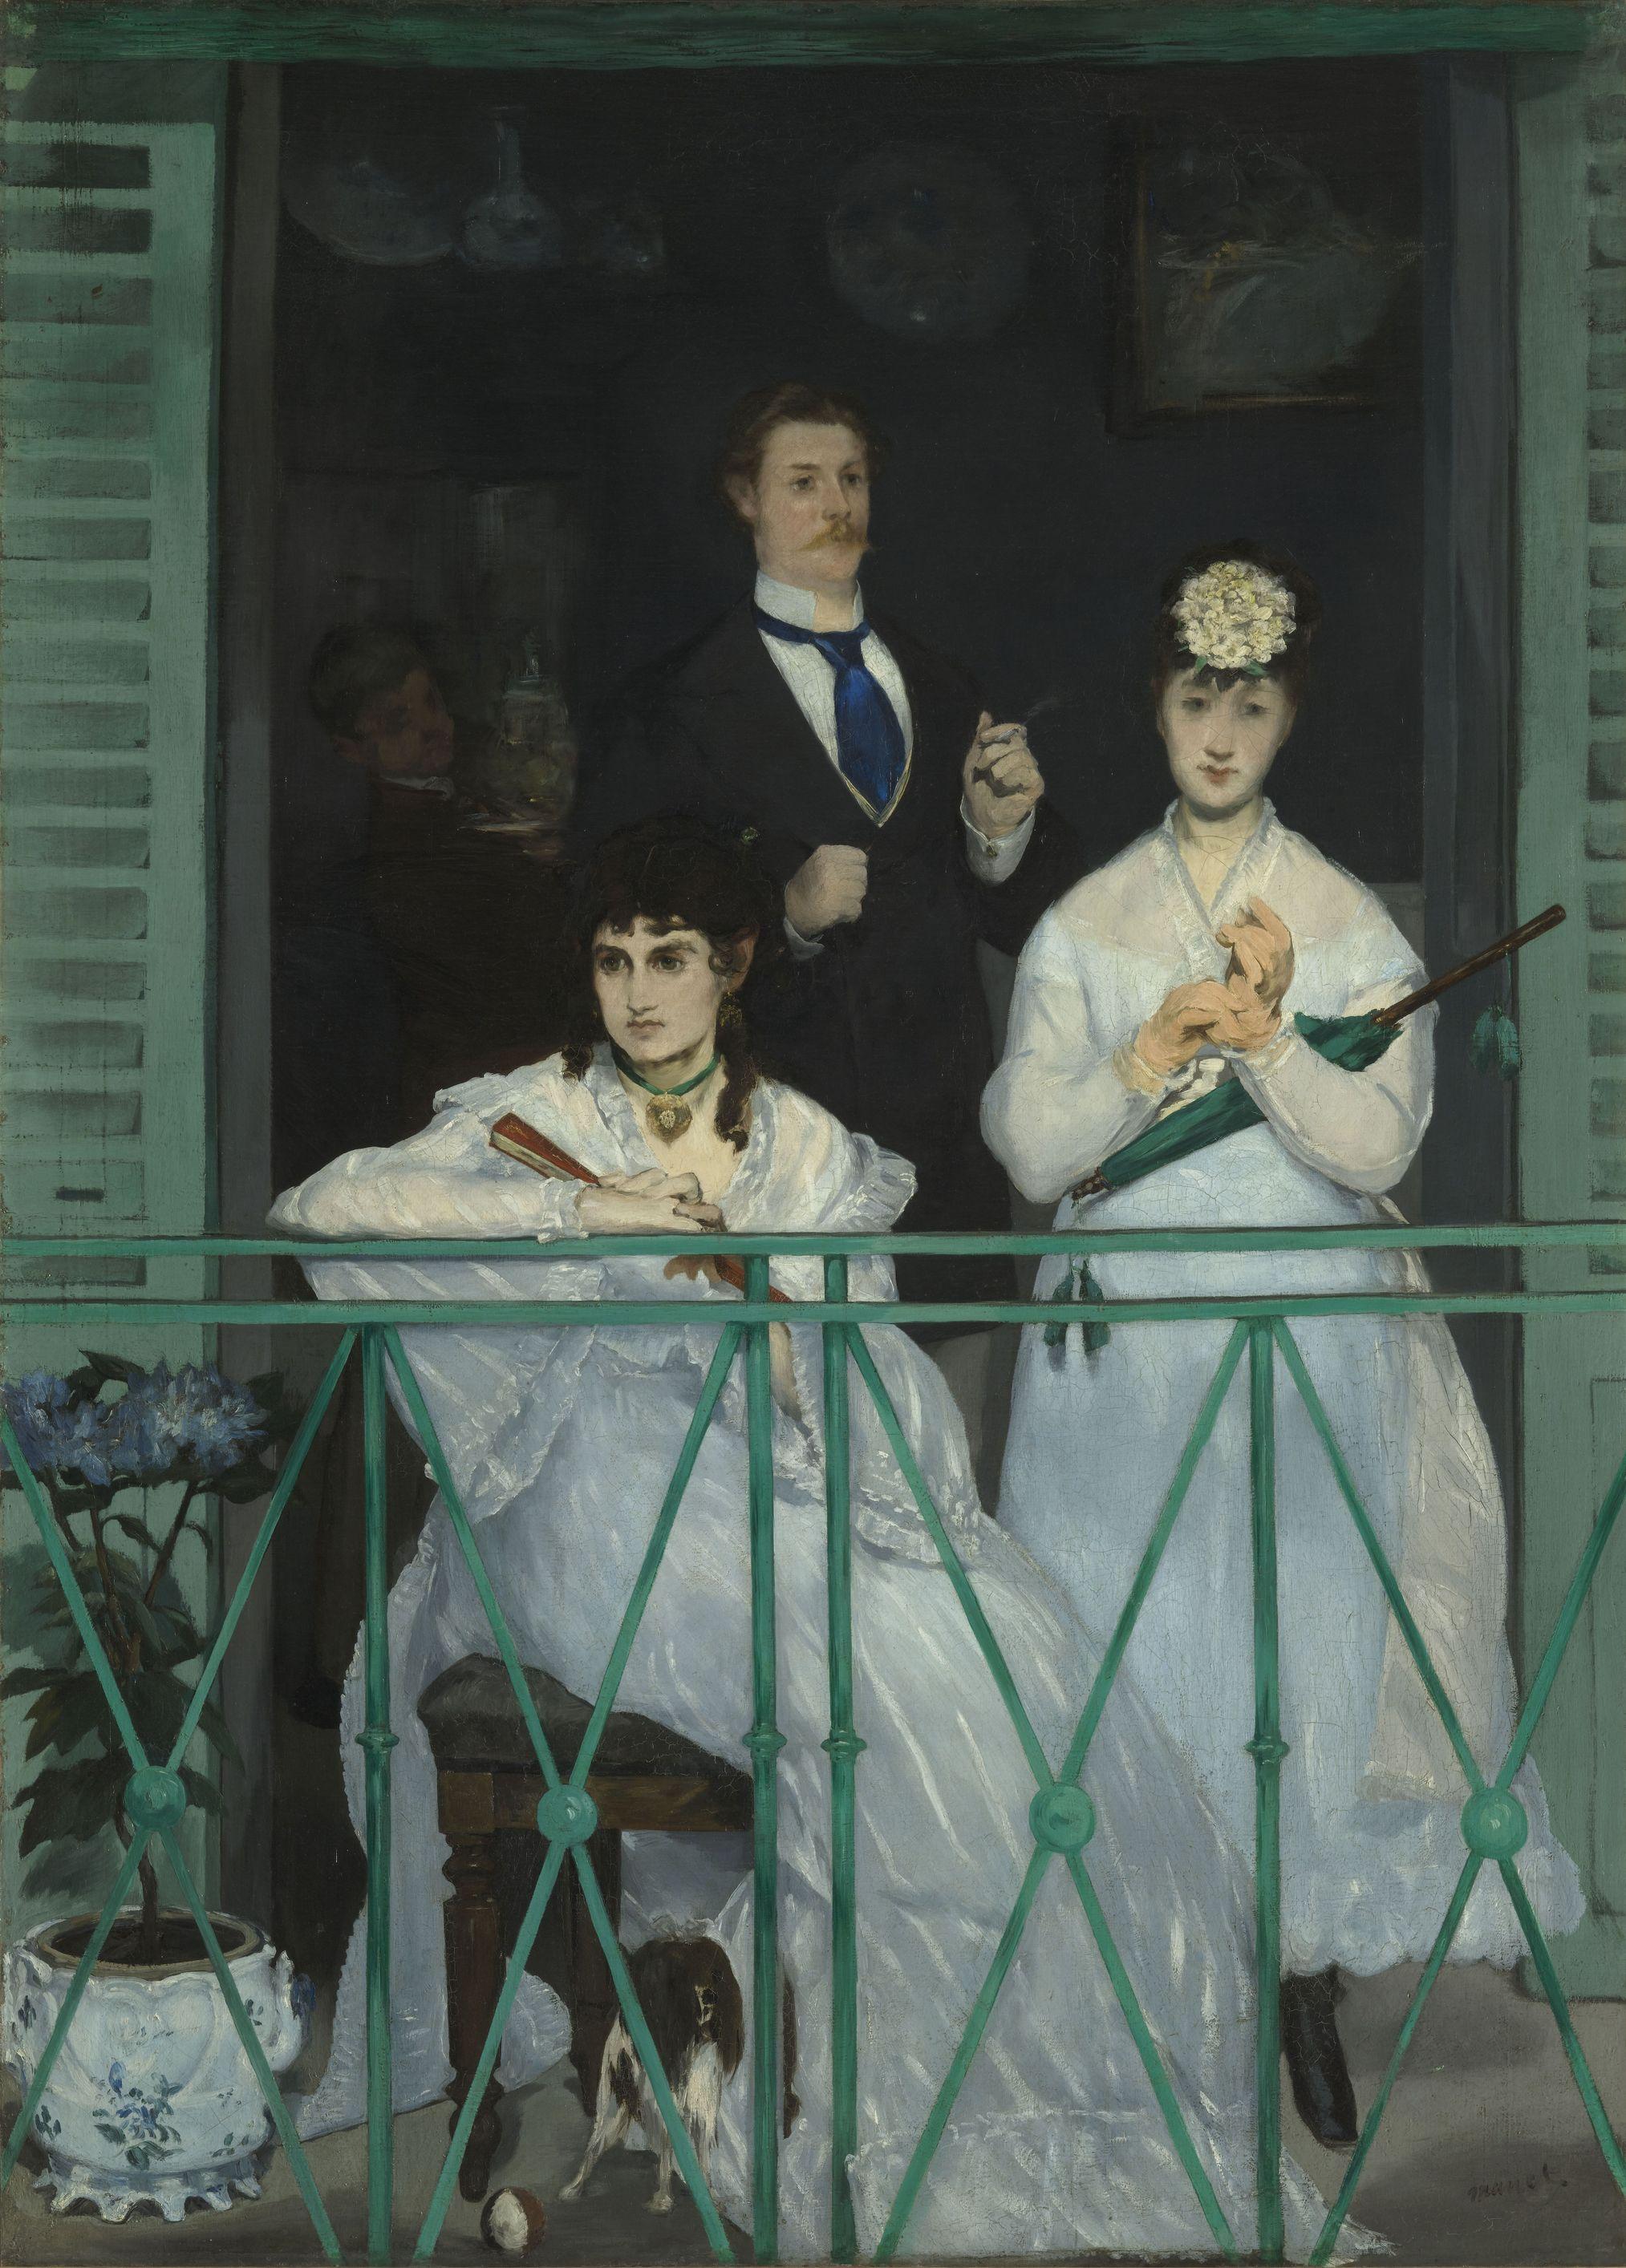 Le balcon / Der Balkon, um 1868/69. Édouard Manet. Öl auf Leinwand, 170 x 124,5 cm. Musée d'Orsay, Paris © bpk/RMN – Grand Palais. Foto: Hervé Lewandowski